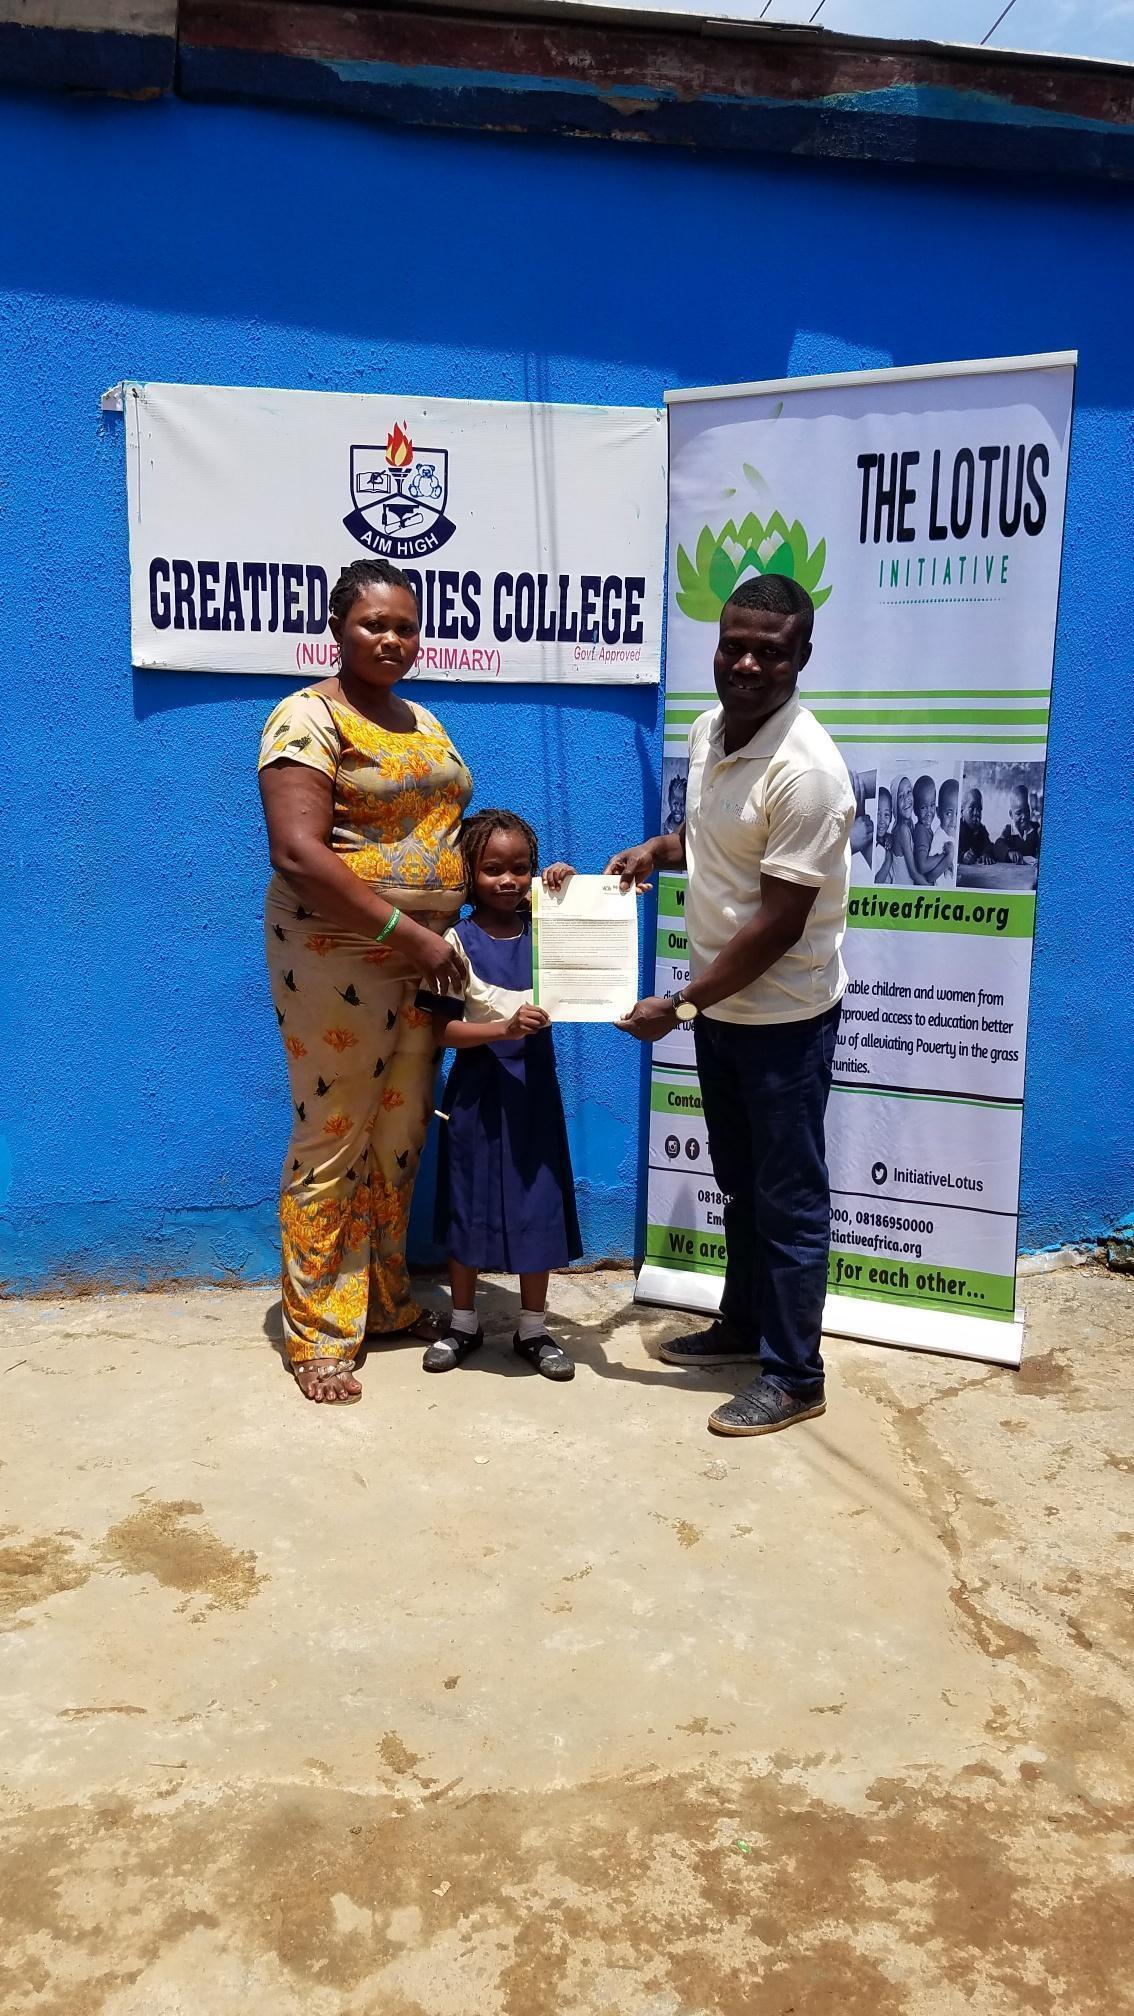 Mrs. Popoola with Scholar Kolapo Popoola and Lotus Initiative Program Manager.